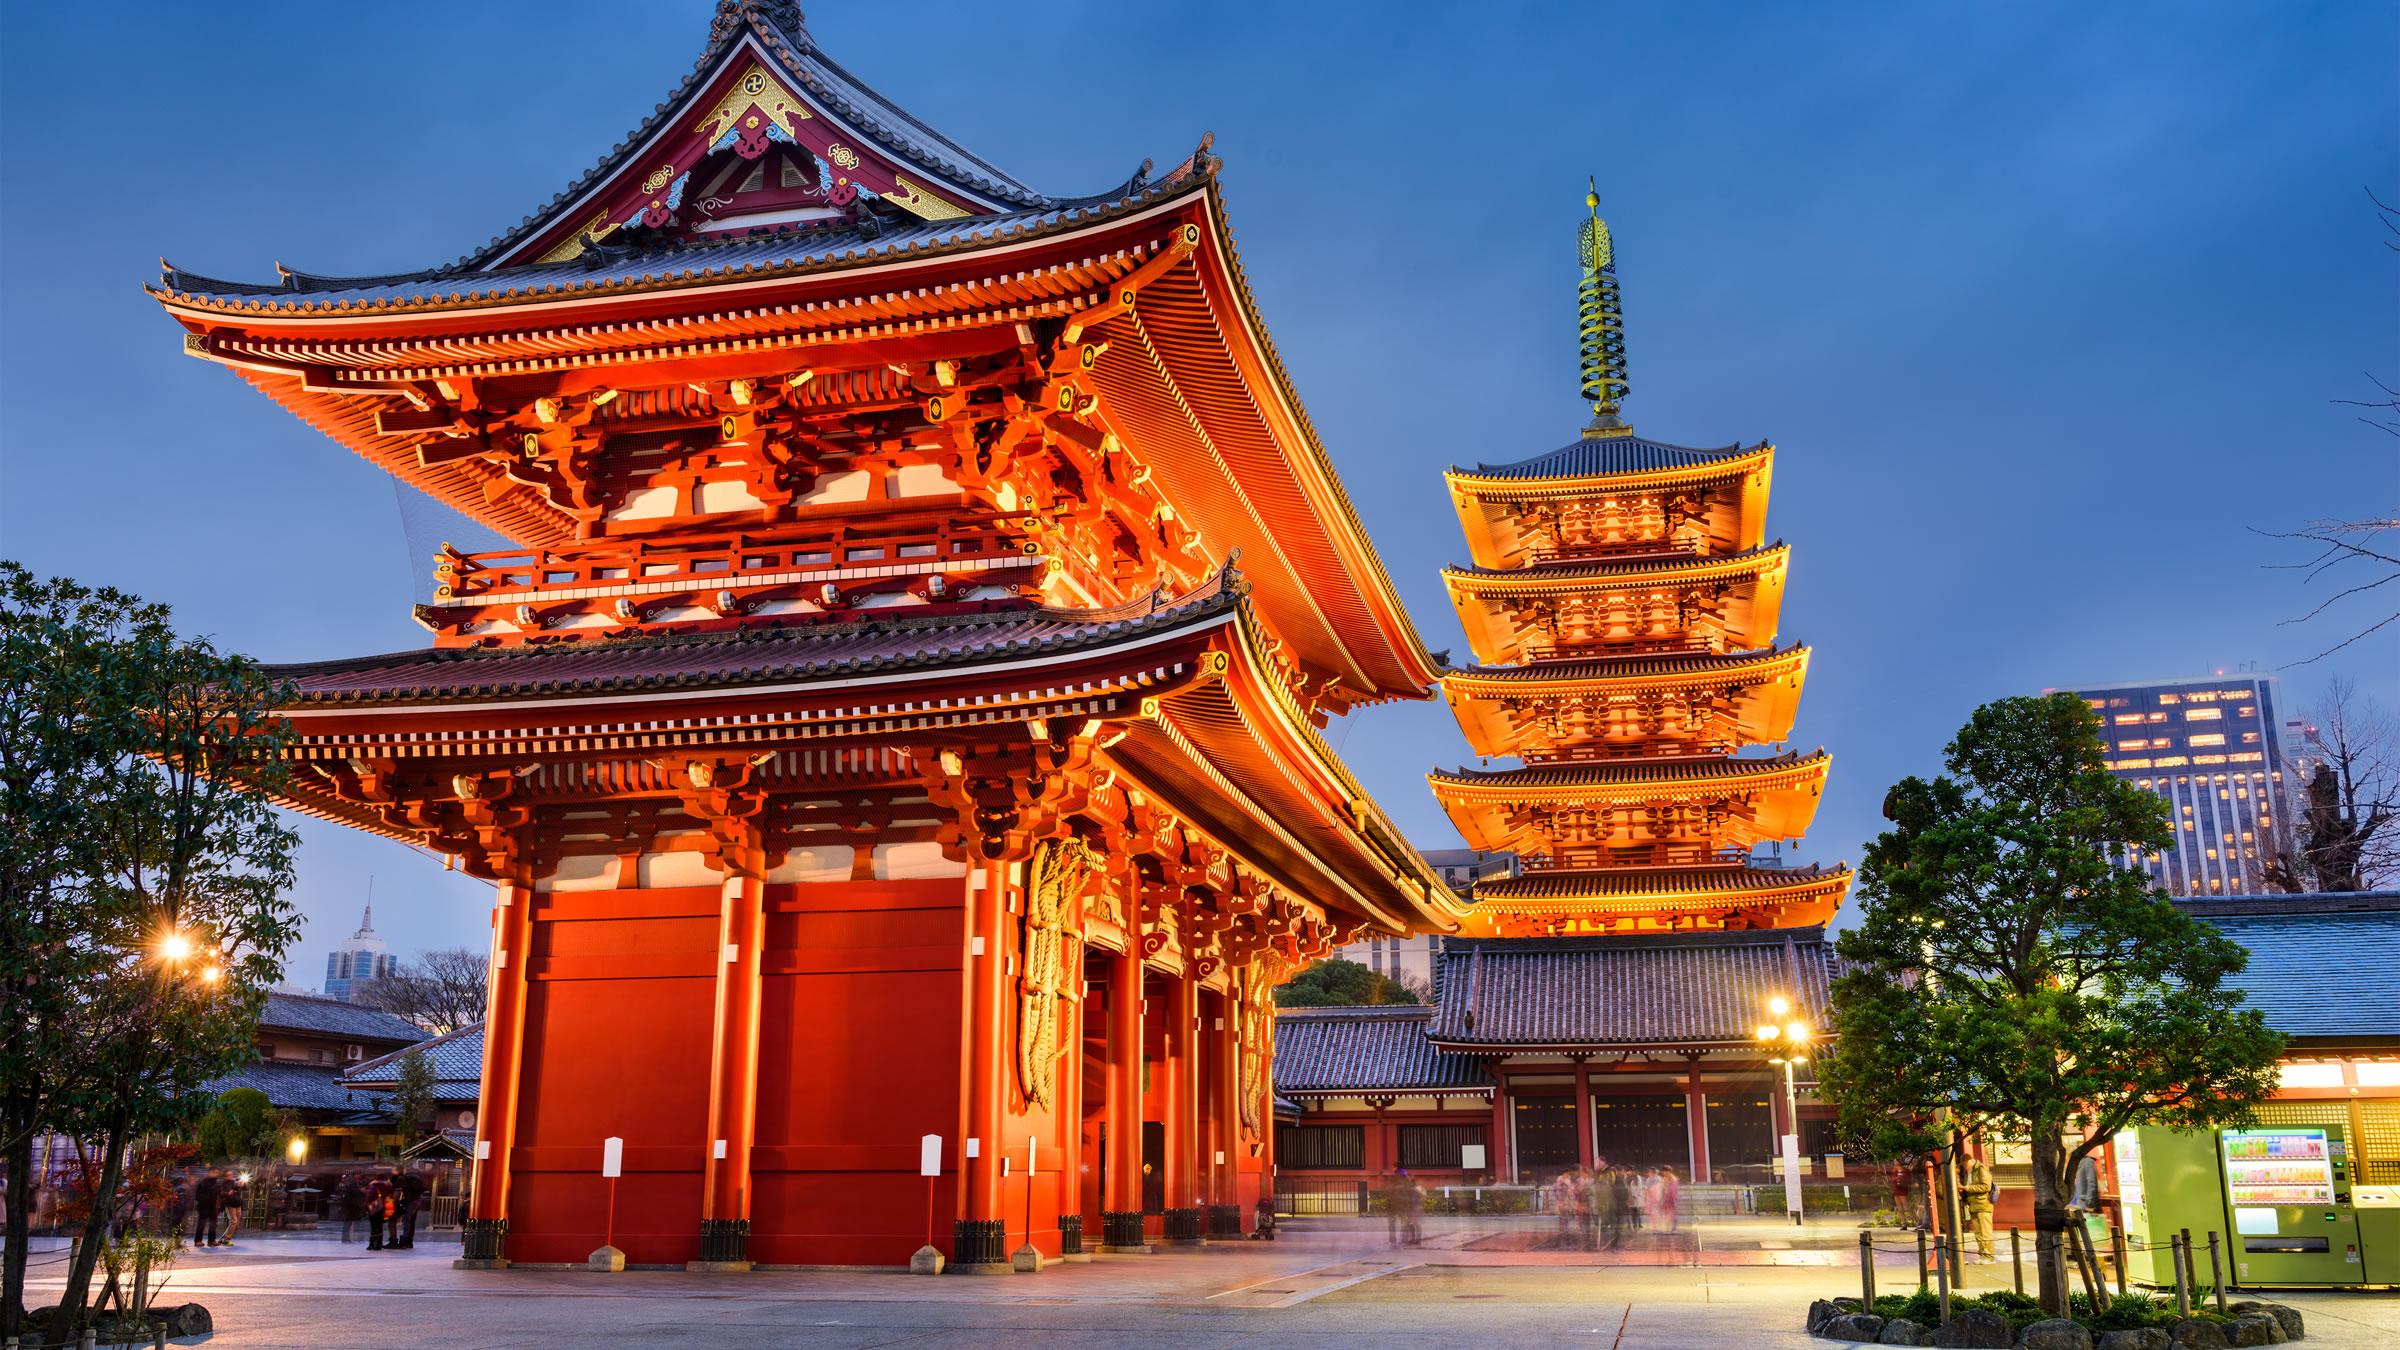 Vuelos A Tokio Con Parada De Unos D 237 As En New York Por